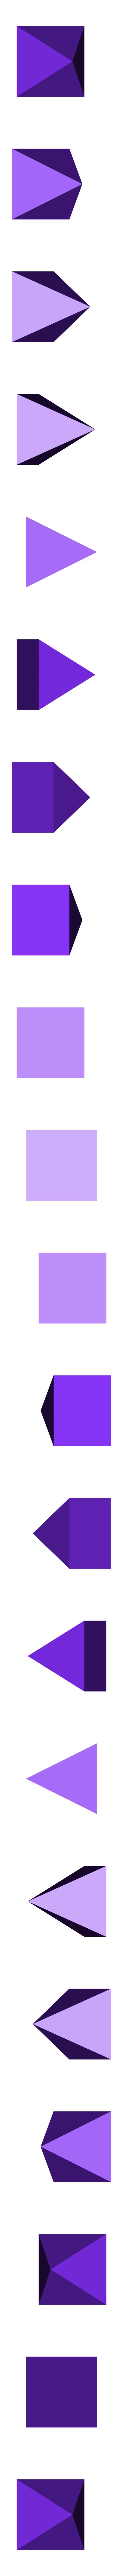 Pyramid Shape.obj Download free OBJ file Pyramid Shape • 3D print object, 3DBuilder